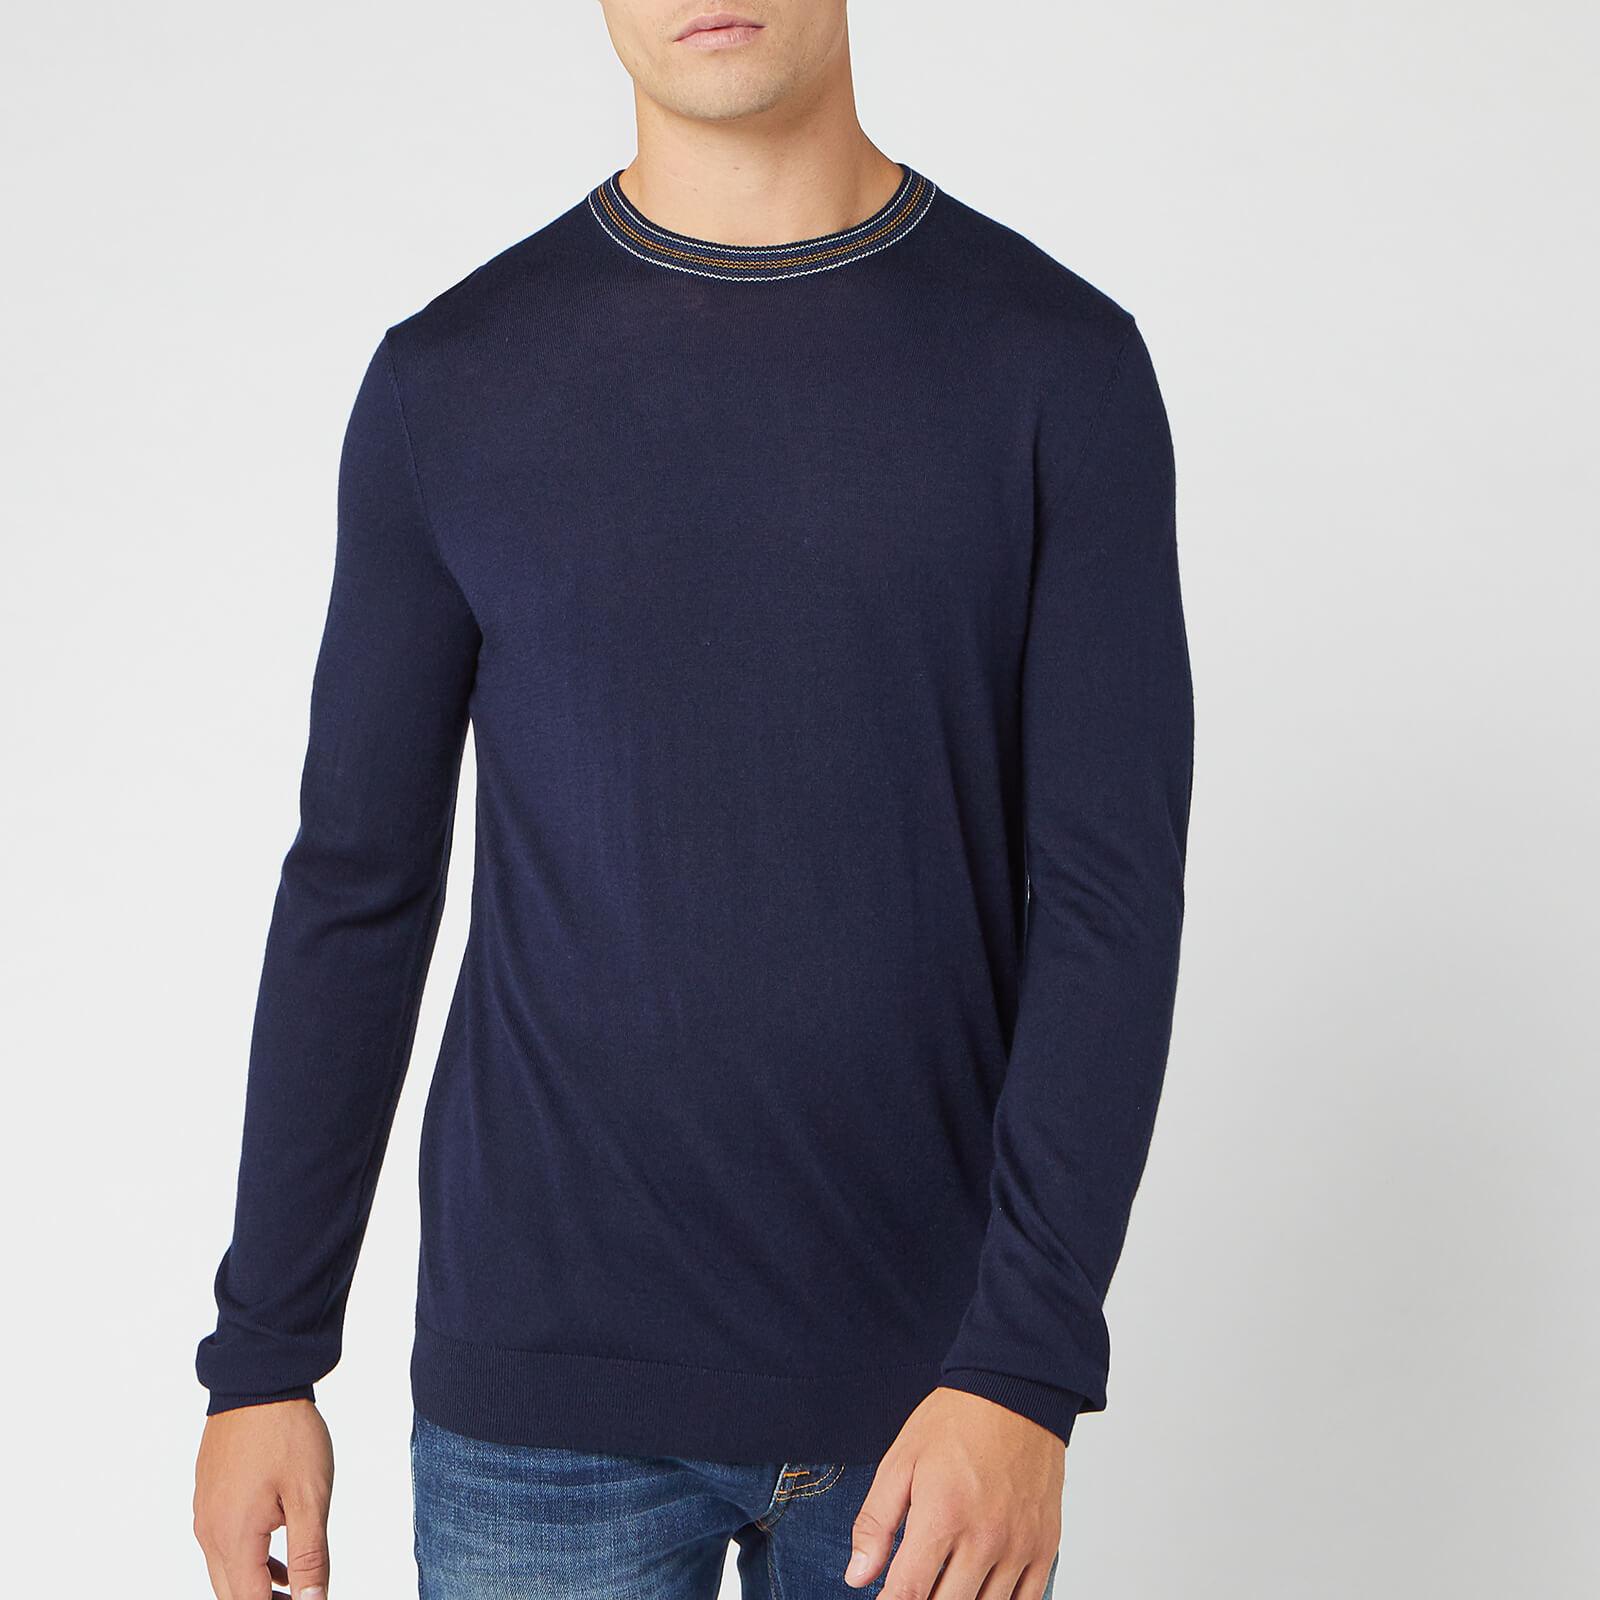 Ted Baker Men's Mailais Crew Neck Knitted Jumper - Navy - L/4